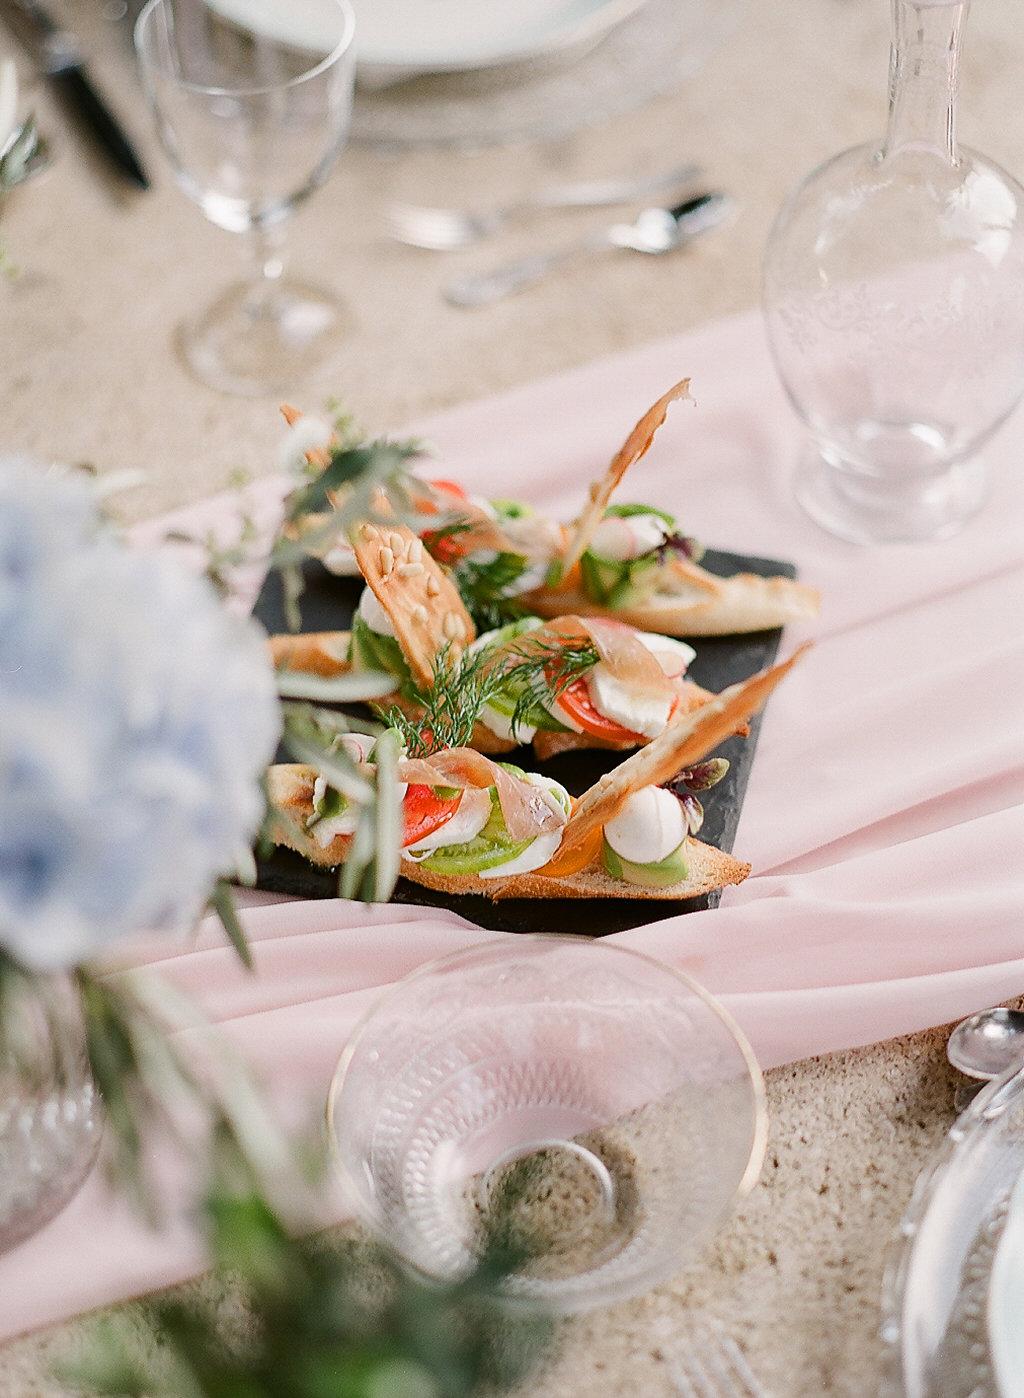 le coeur dans les etoiles - wedding planner - provence - luberon - alpilles - drome - vaucluse - sardaigne - italie - organisation - mariage - shooting - dolce vita - valery villard-433